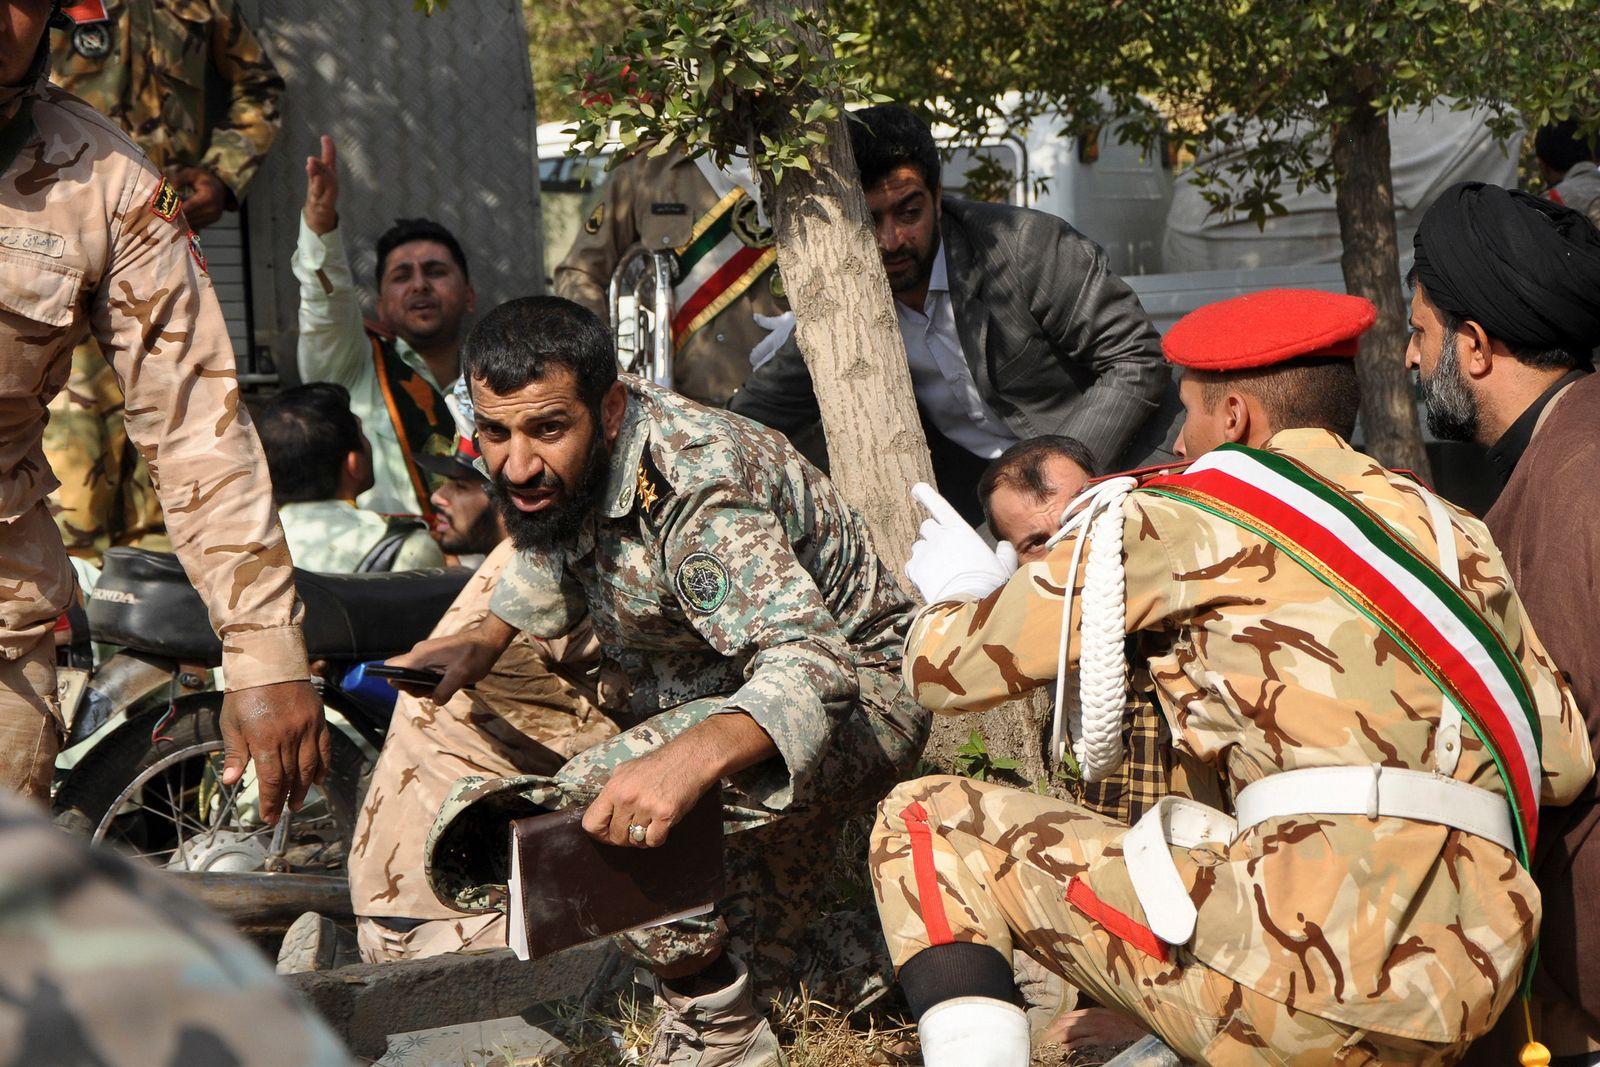 Angriff auf Militärparade im Iran